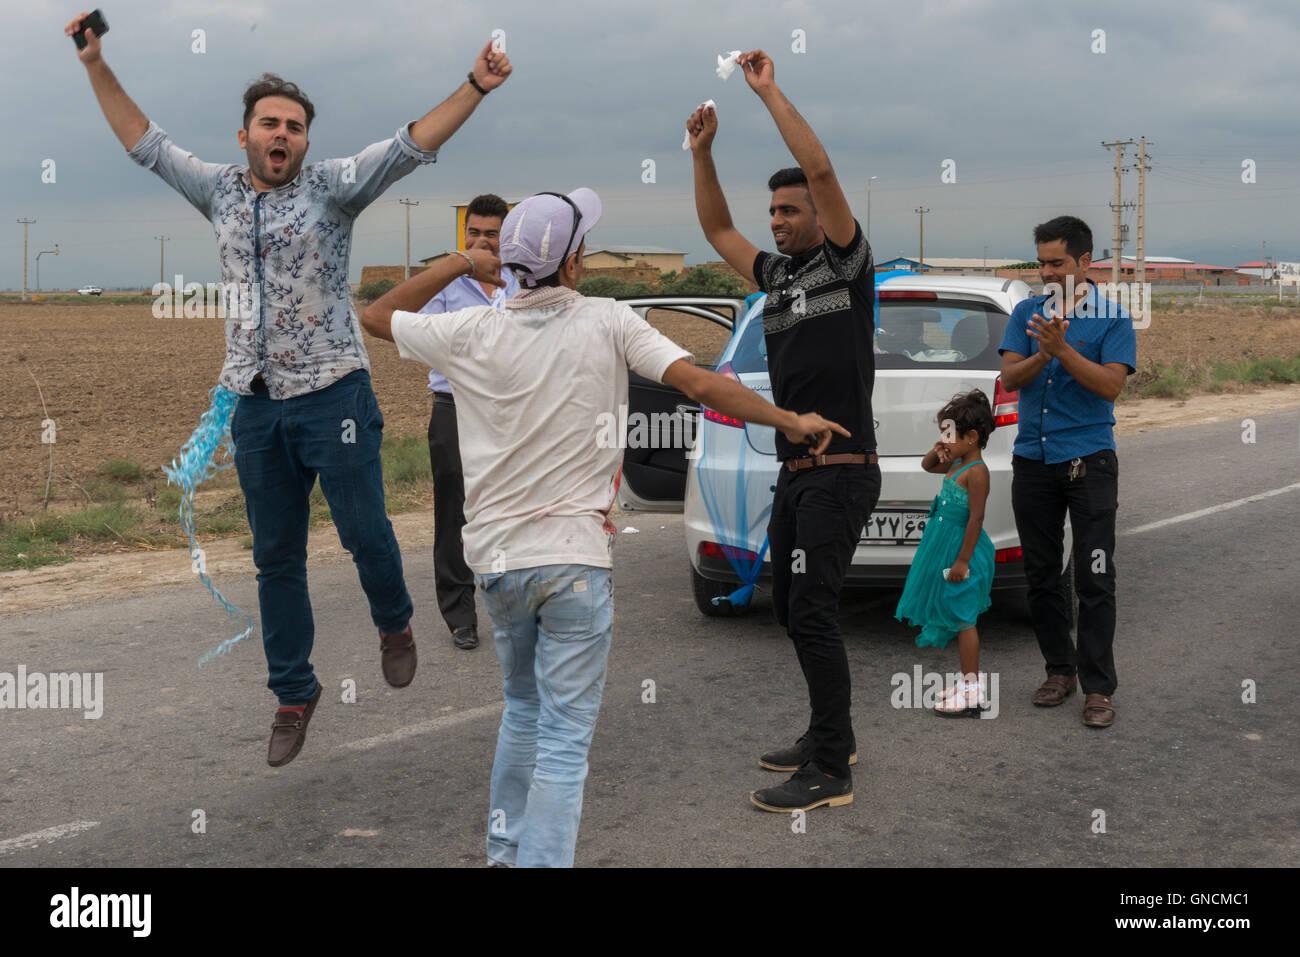 Bandar Torkaman, Turkmen Wedding, Male Guests Dancing On The Road - Stock Image